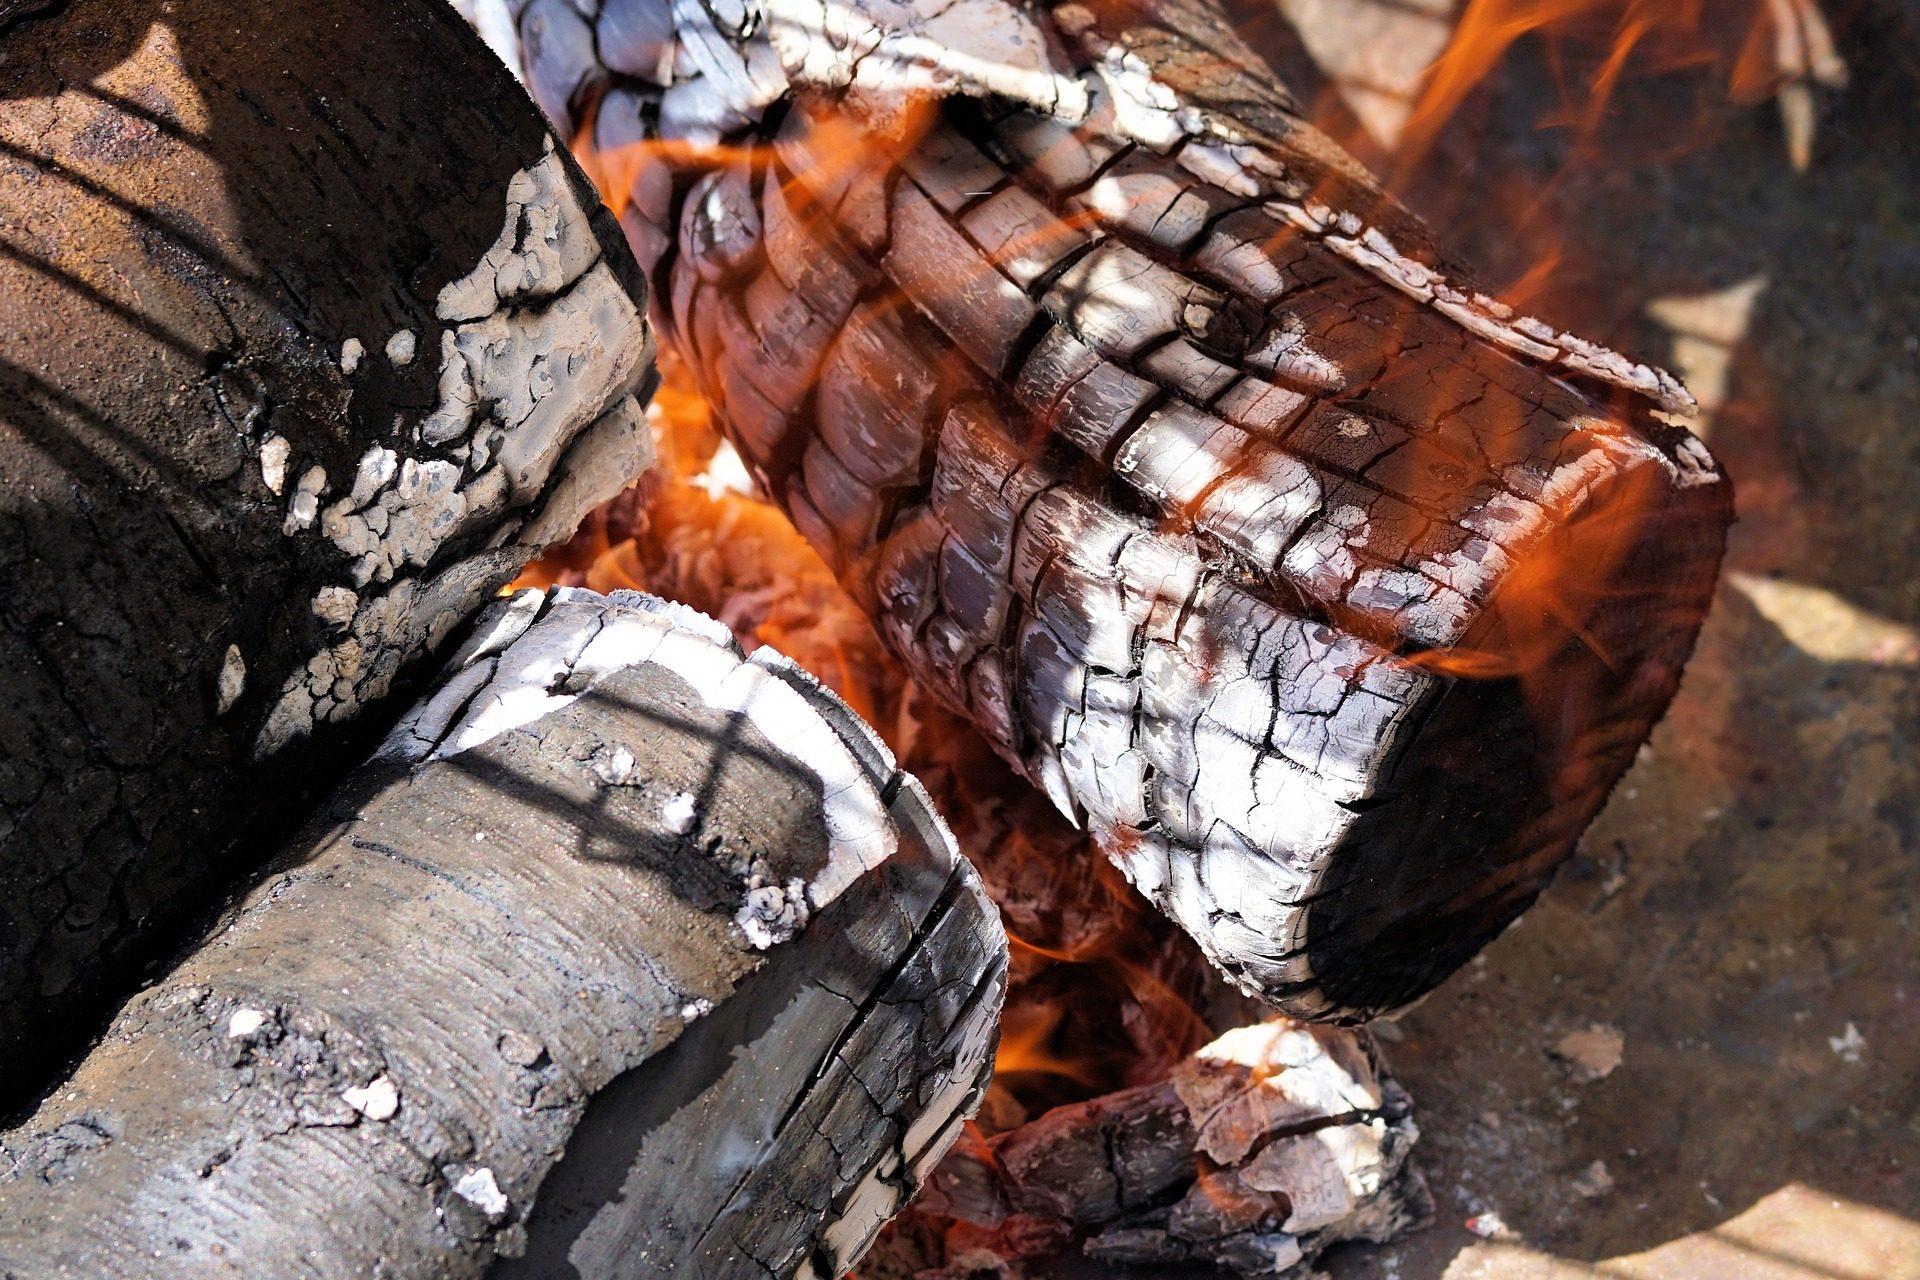 fuego, ascuas, carbón, hoguera, llamas - Fondos de Pantalla HD - professor-falken.com